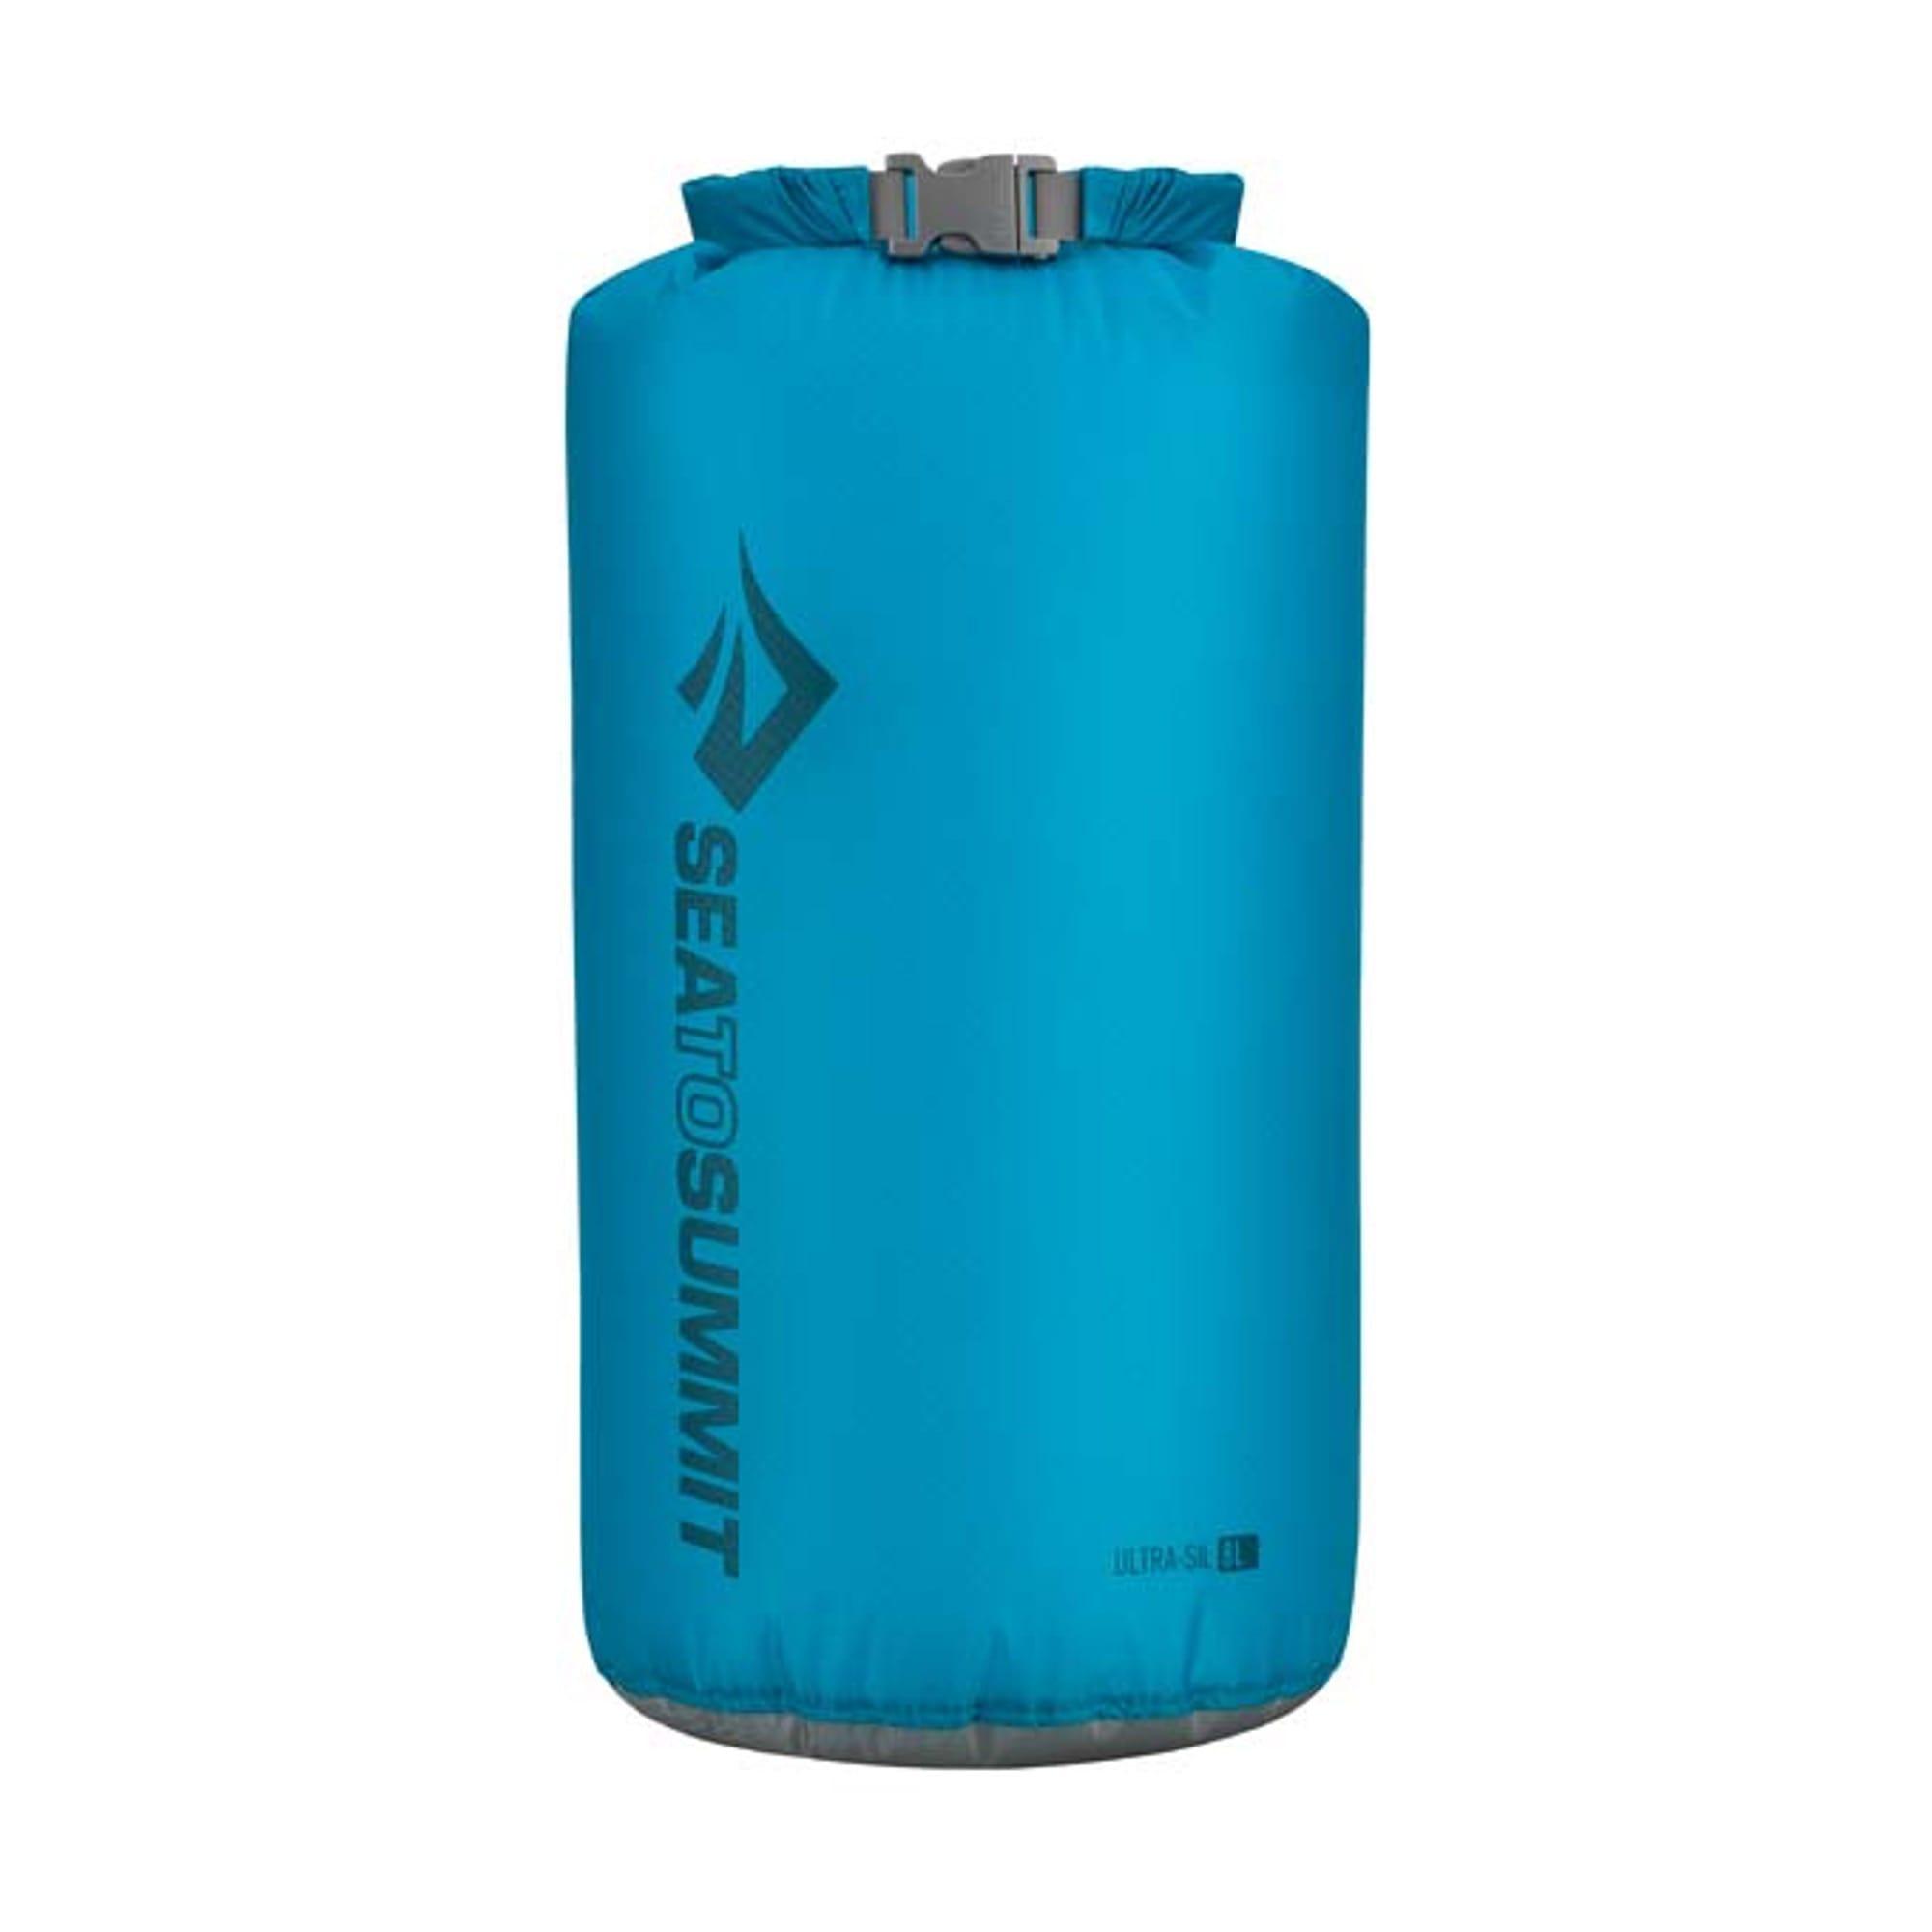 Sea to Summit UltraSil Drysack 8 Liter